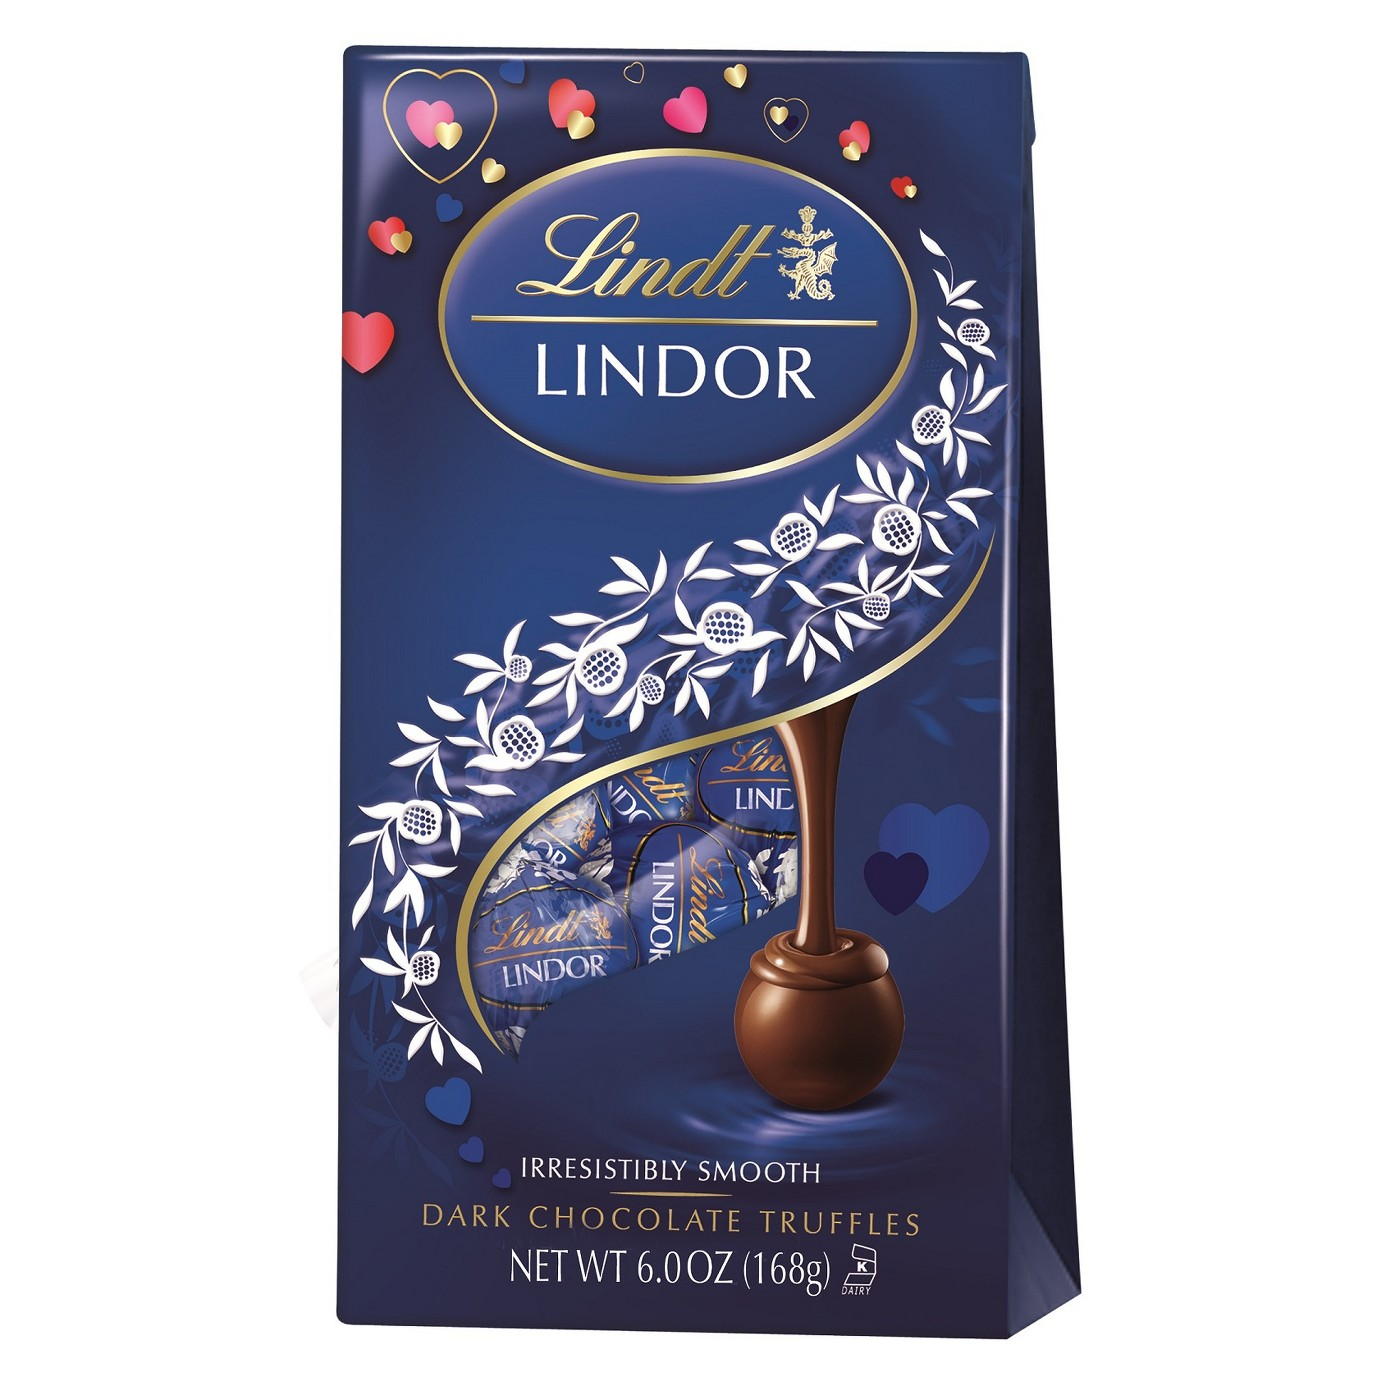 Lindor Valentine's Day Dark Chocolate Truffles - 6oz - image 1 of 1